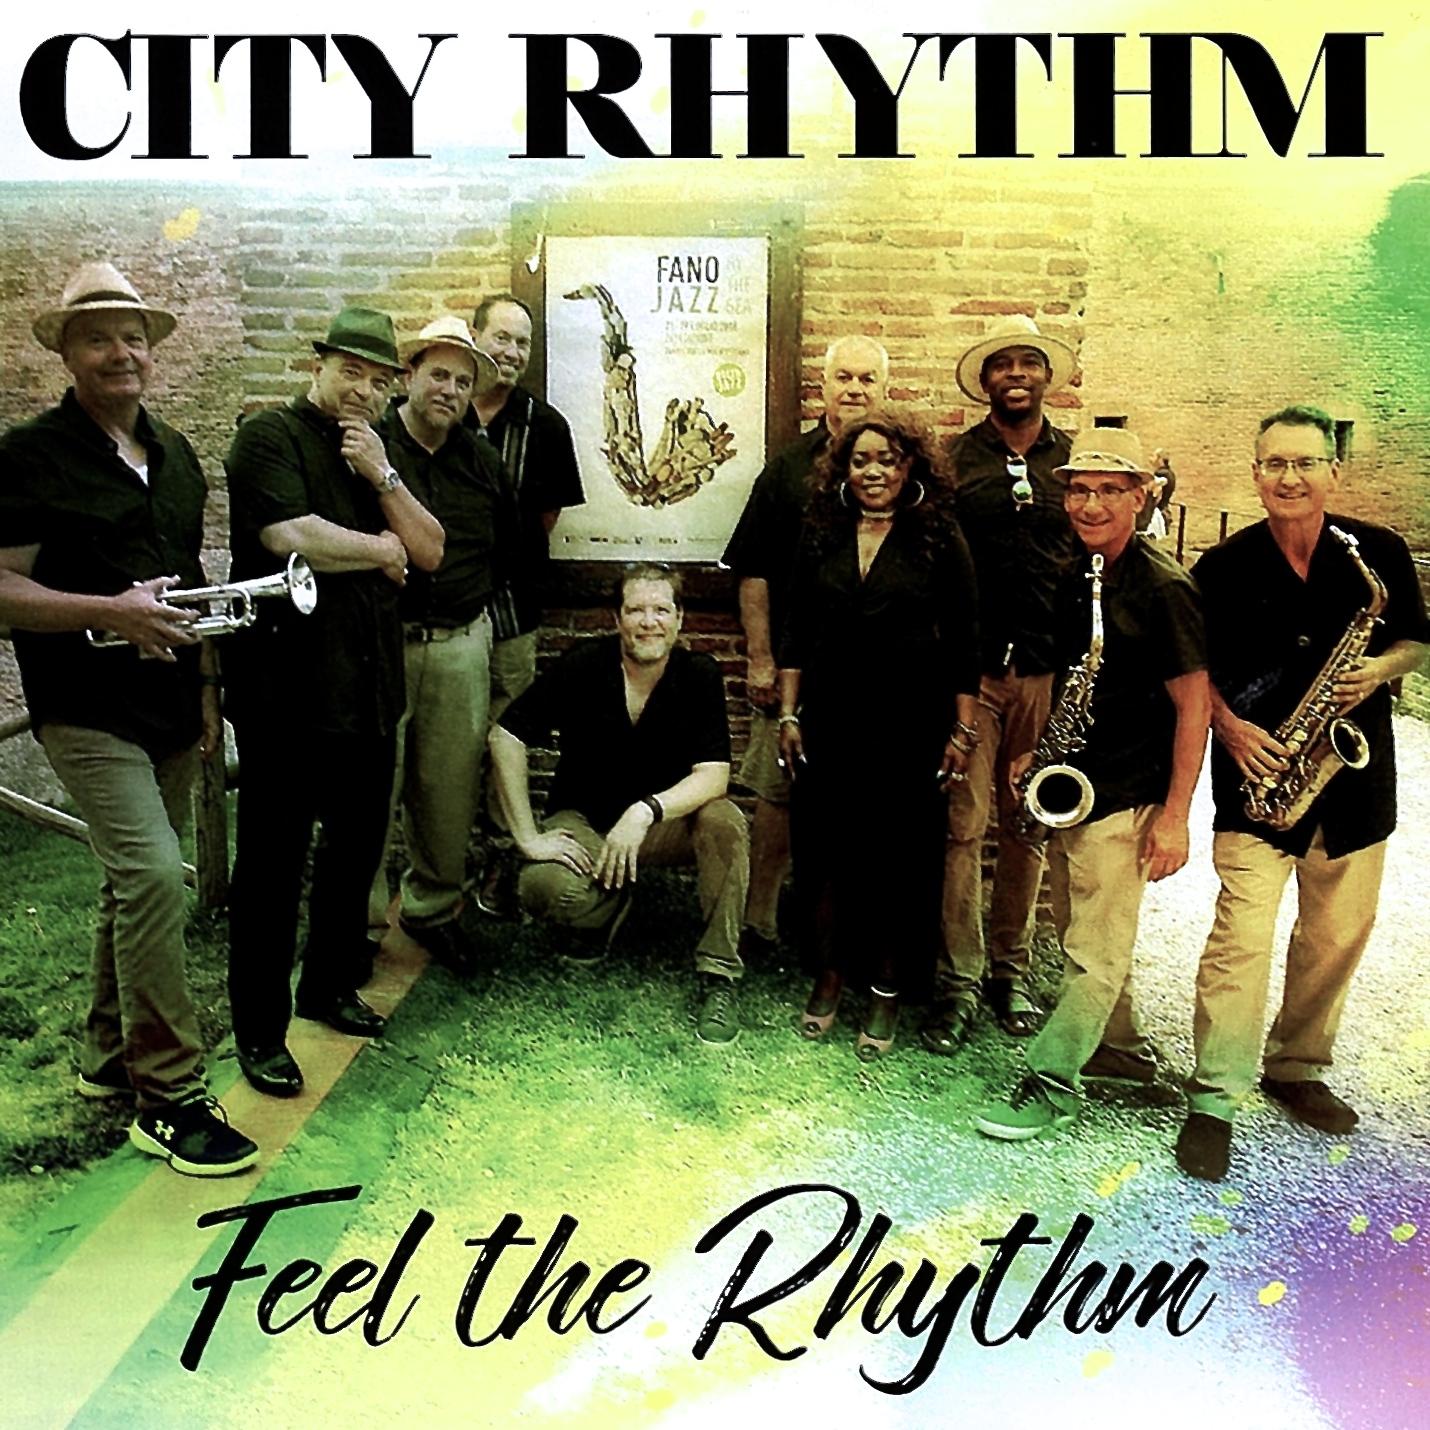 Feel the Rhythm CD.jpg